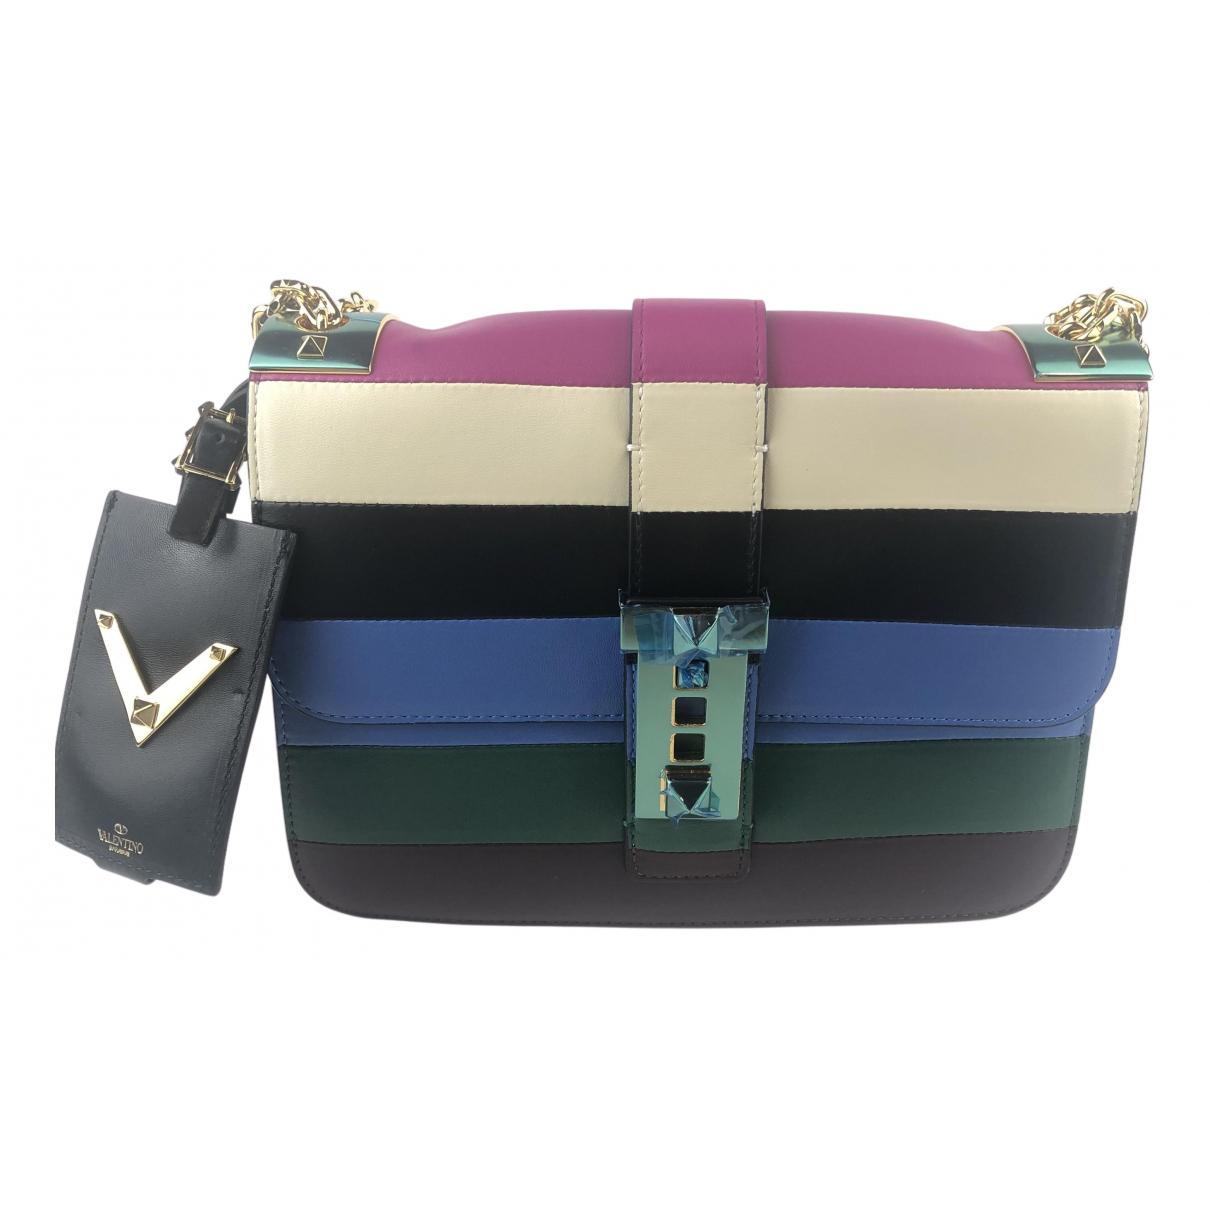 Valentino Garavani Glam Lock Multicolour Leather handbag for Women N